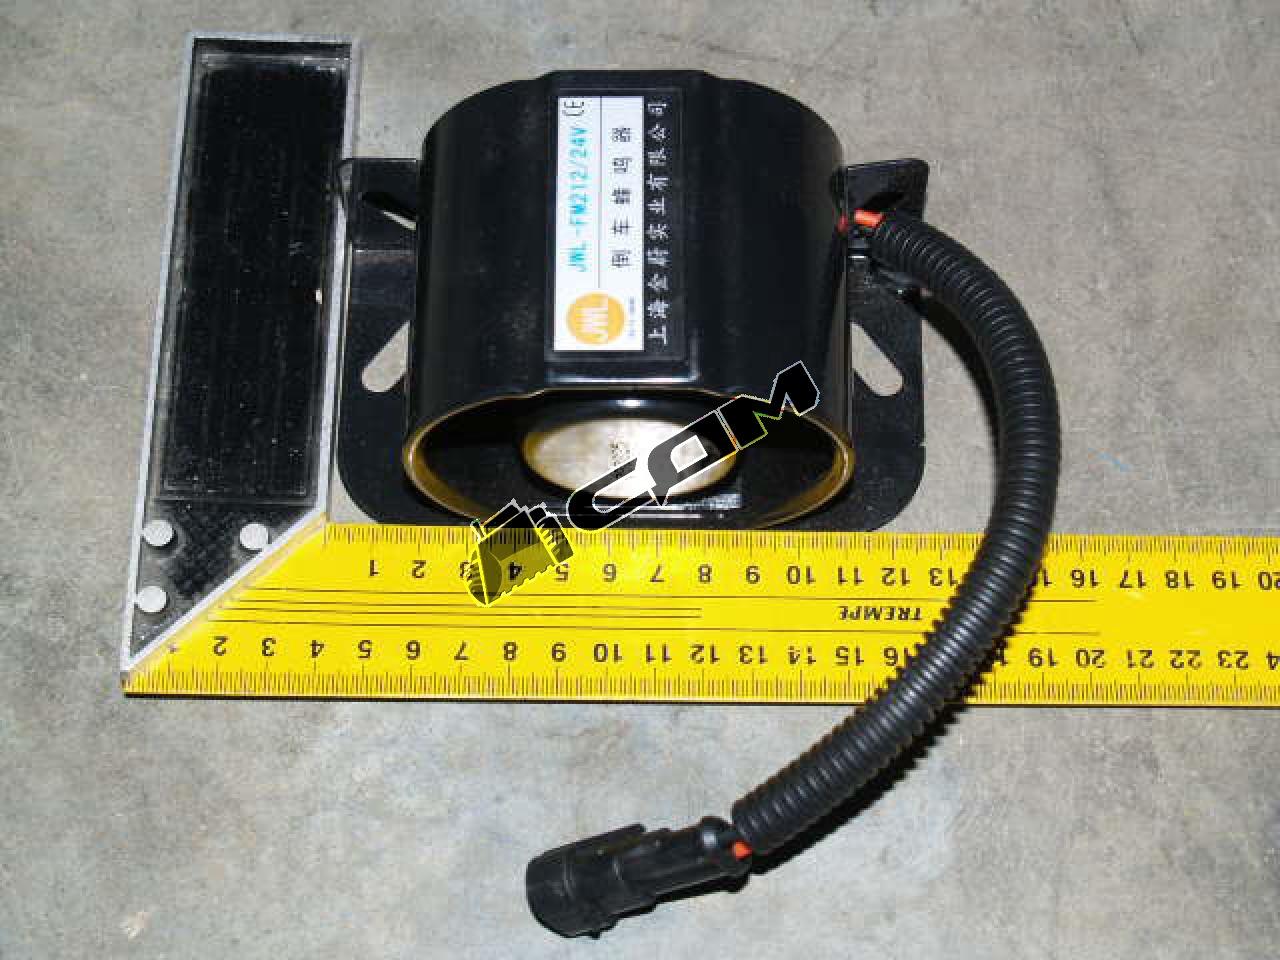 Зуммер  заднего хода 24V CDM855E.15 II.20 (JWL-FM212) CDM855E.15 ll.20